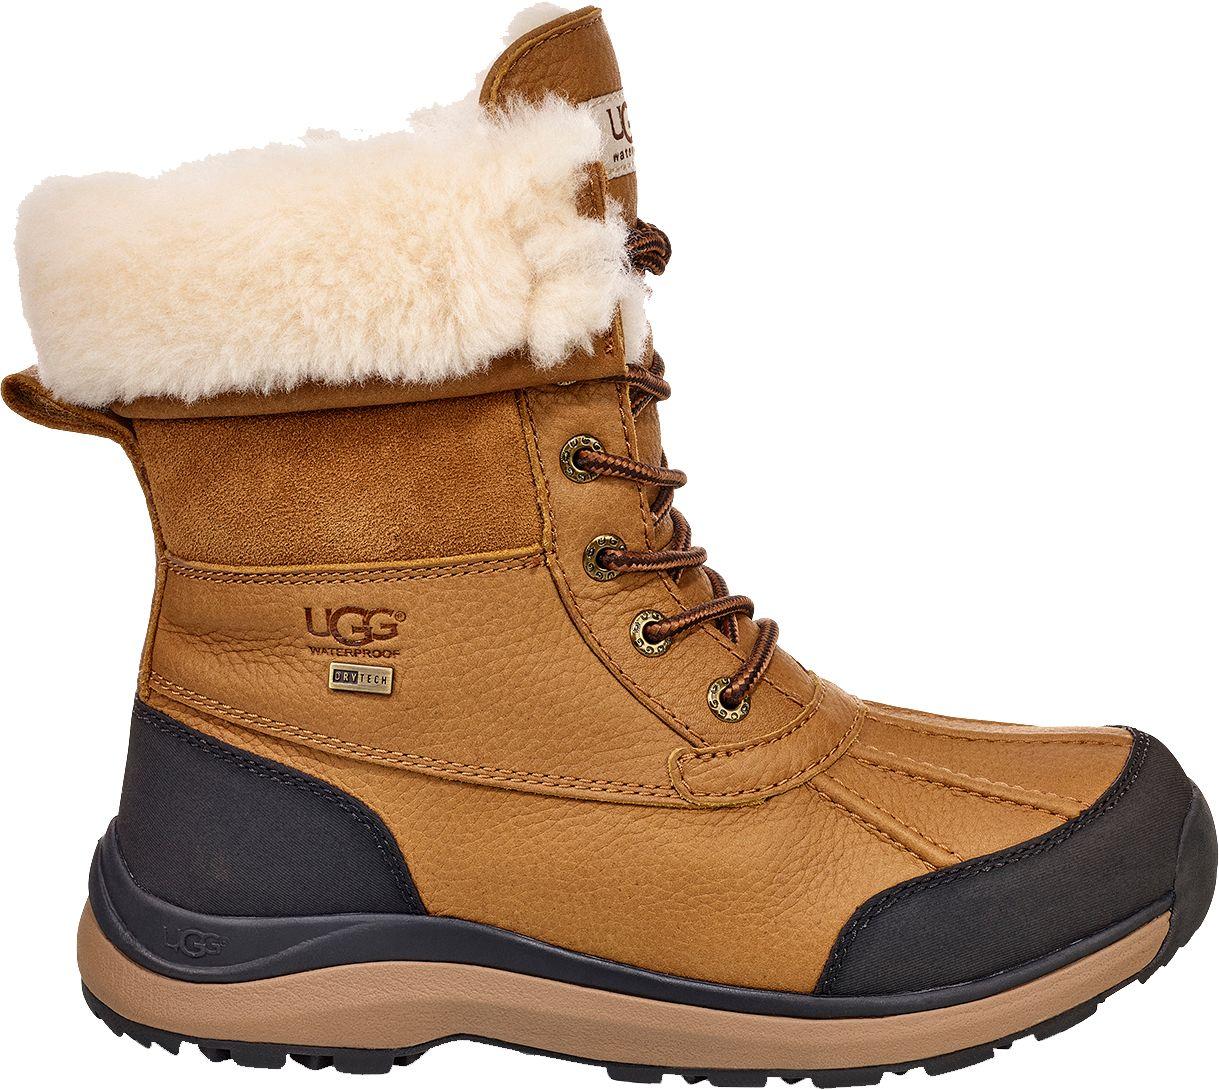 8e7b3eeee22 UGG Women's Adirondack III 200g Waterproof Winter Boots